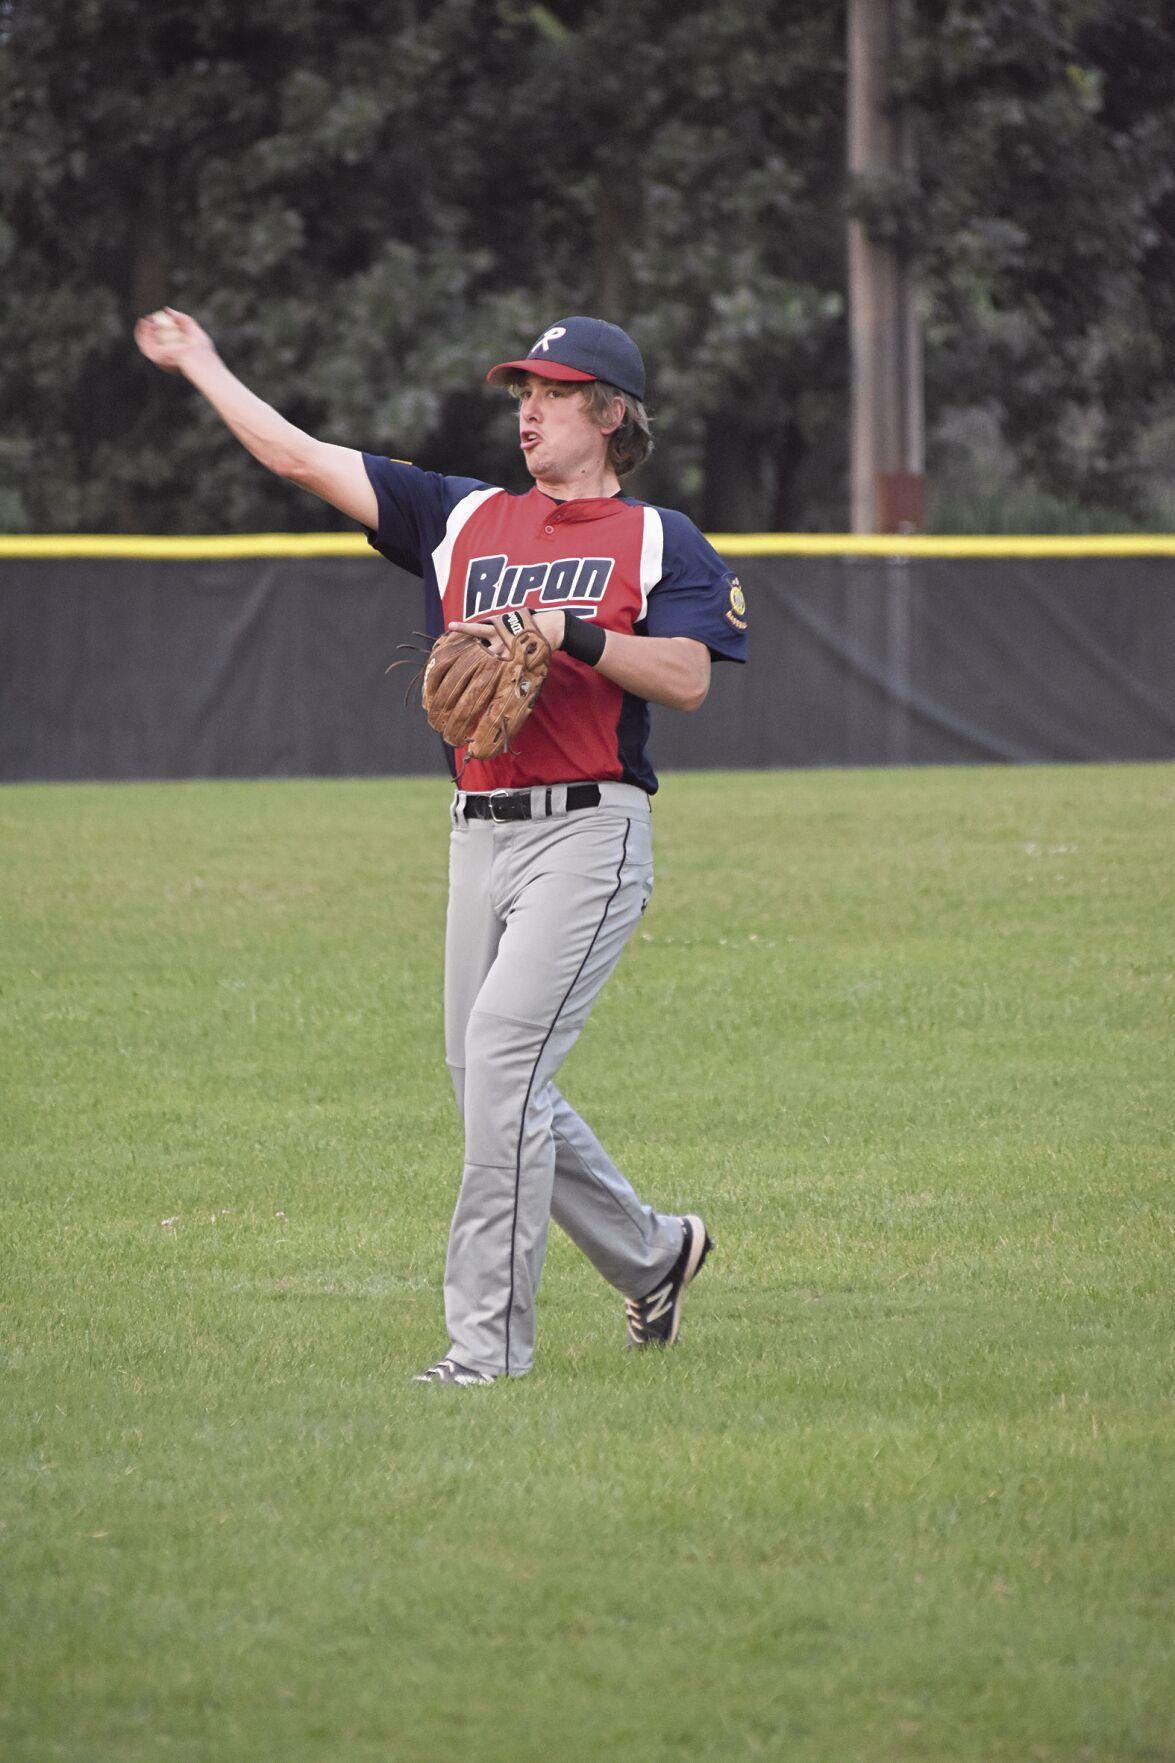 Ripon American Legion baseball at Green Lake —July 19, 2021 (Miya Grunert photos).JPG